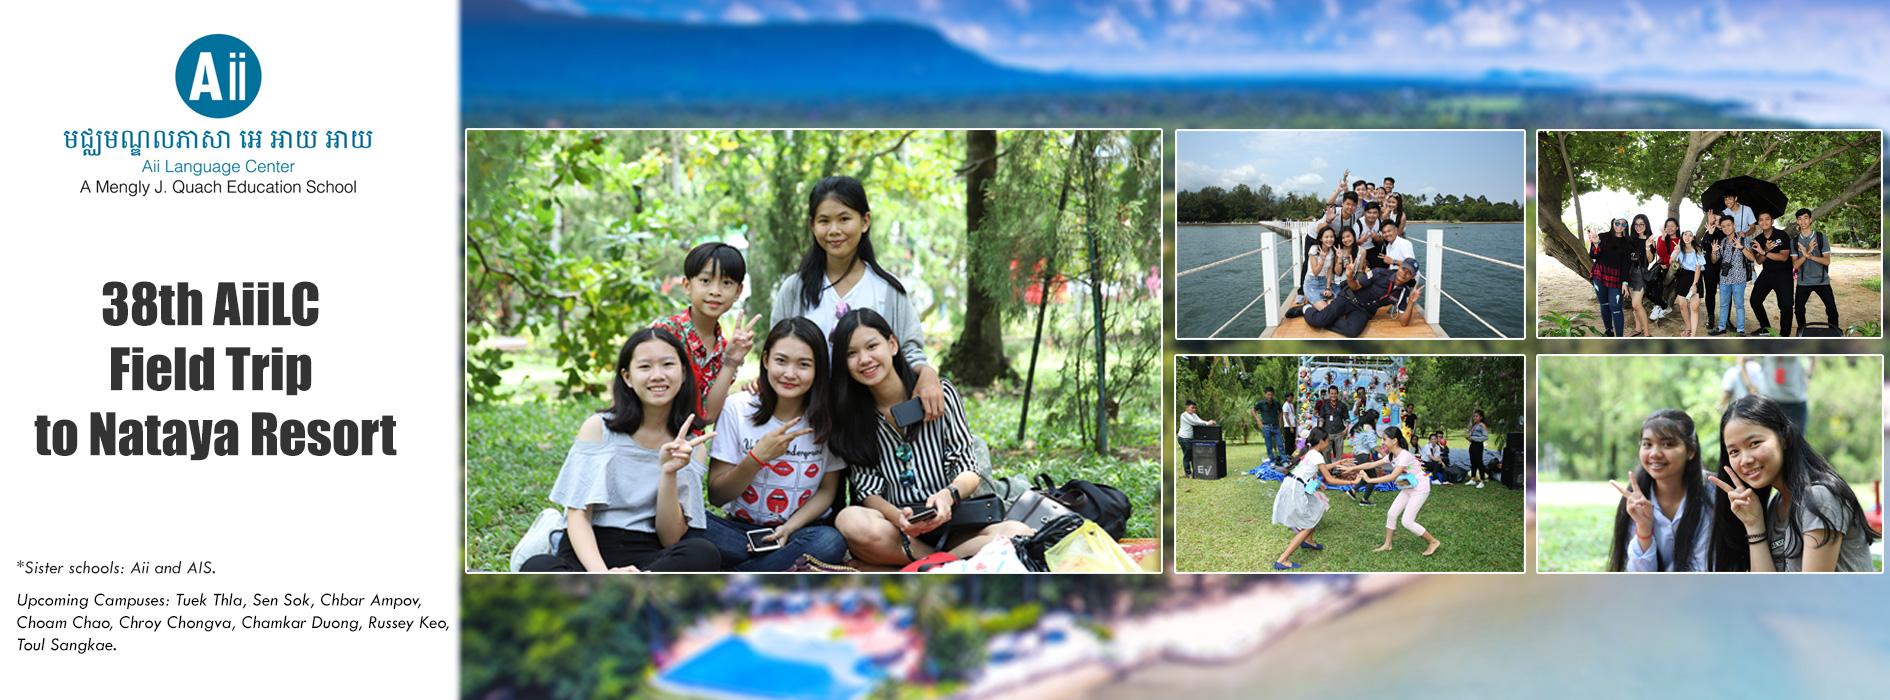 aiilc-field-trip-to-nataya